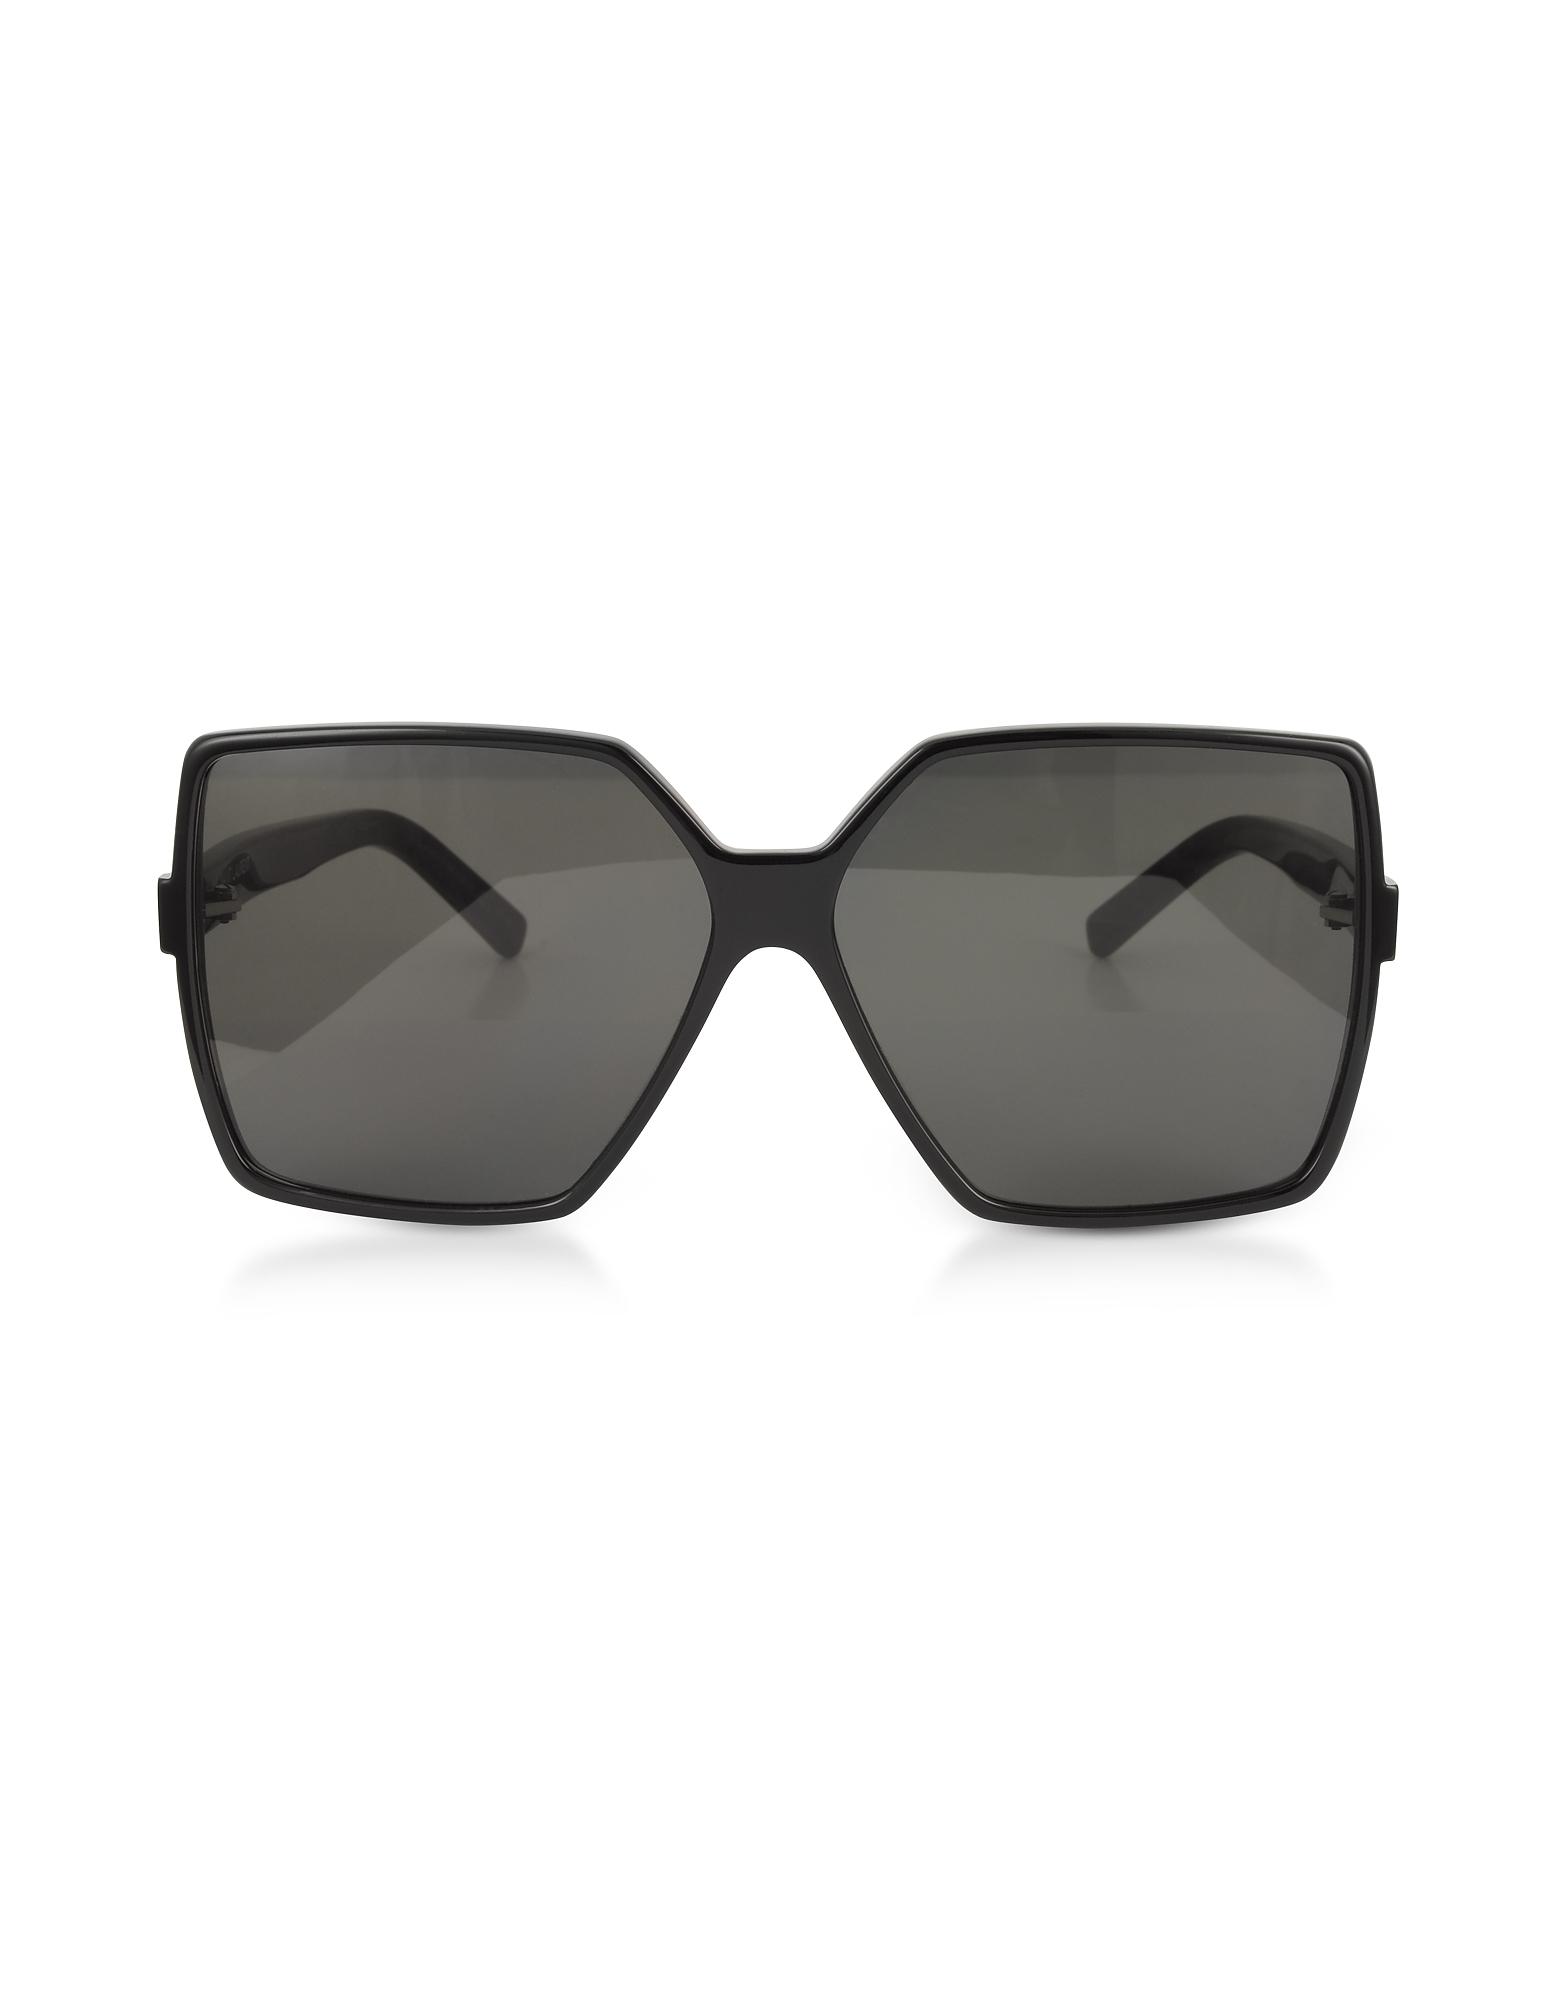 SL 232 Betty Oversize Acetate Women's Sunglasses